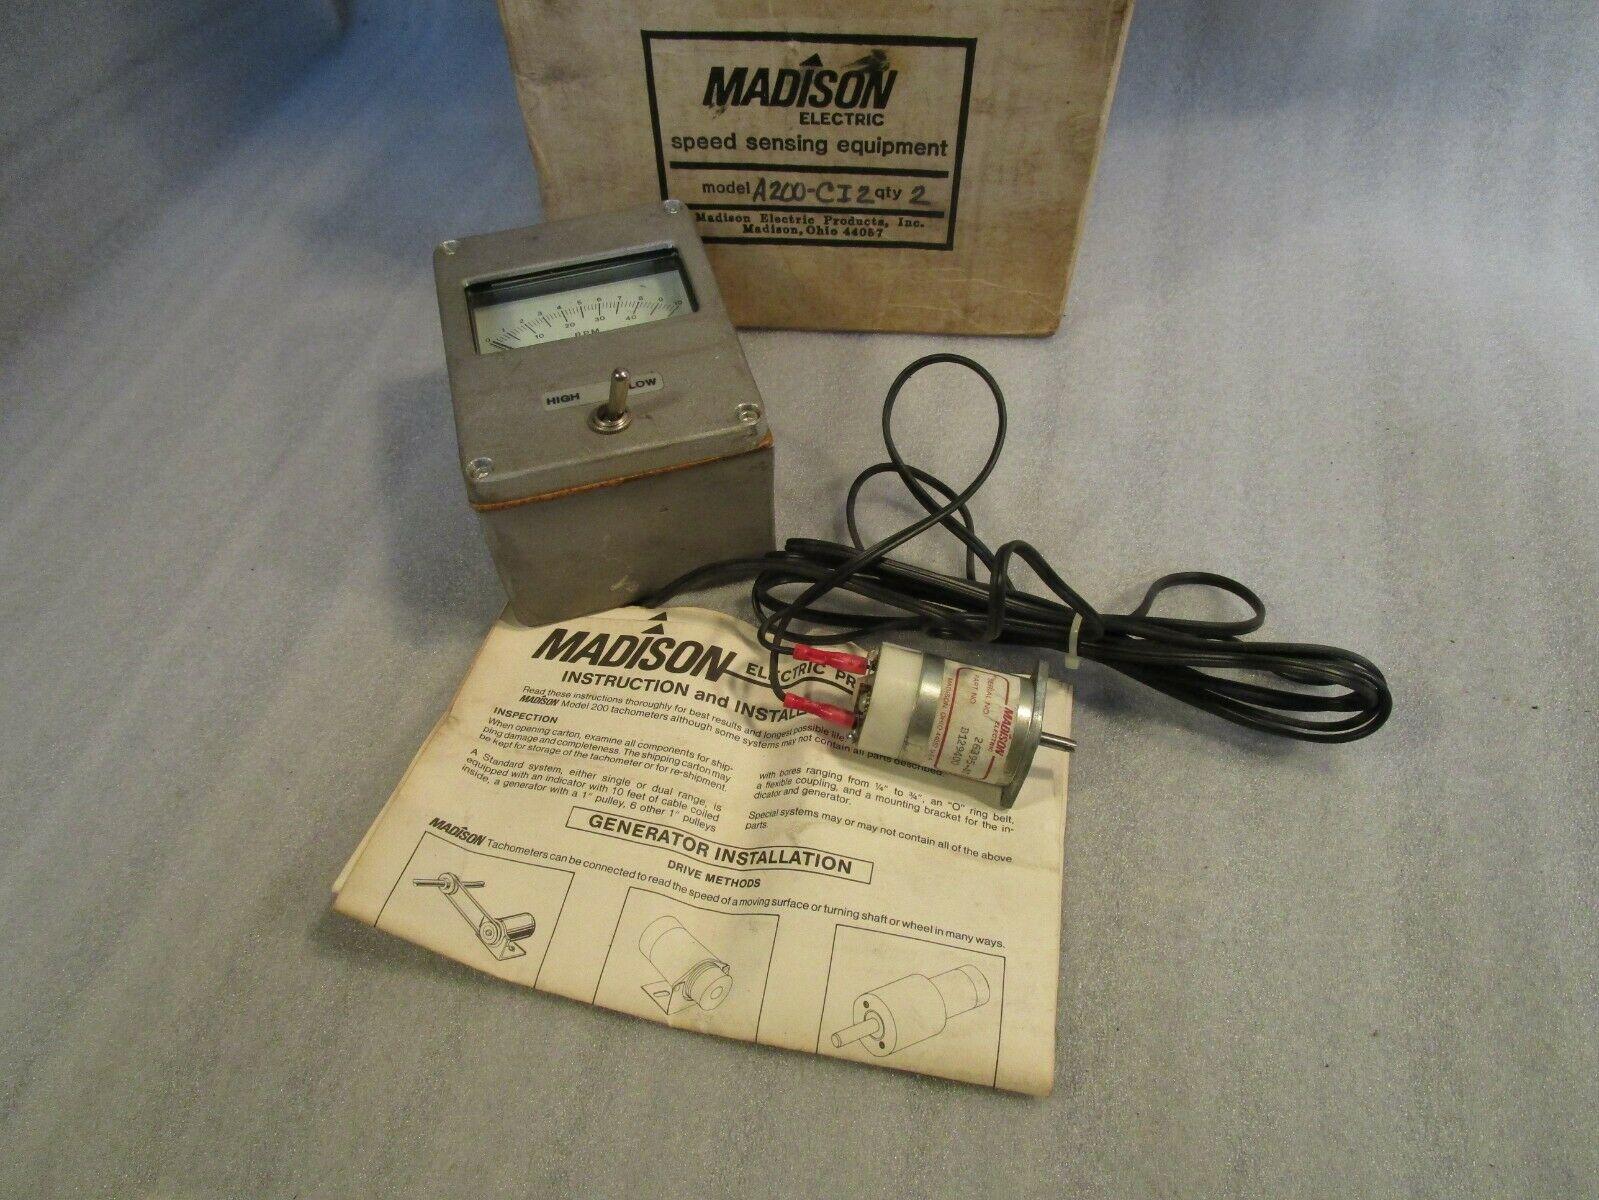 MADISON Electric Products A200-CI2 RPM Gauge w/ MADISON Tachometer B129400